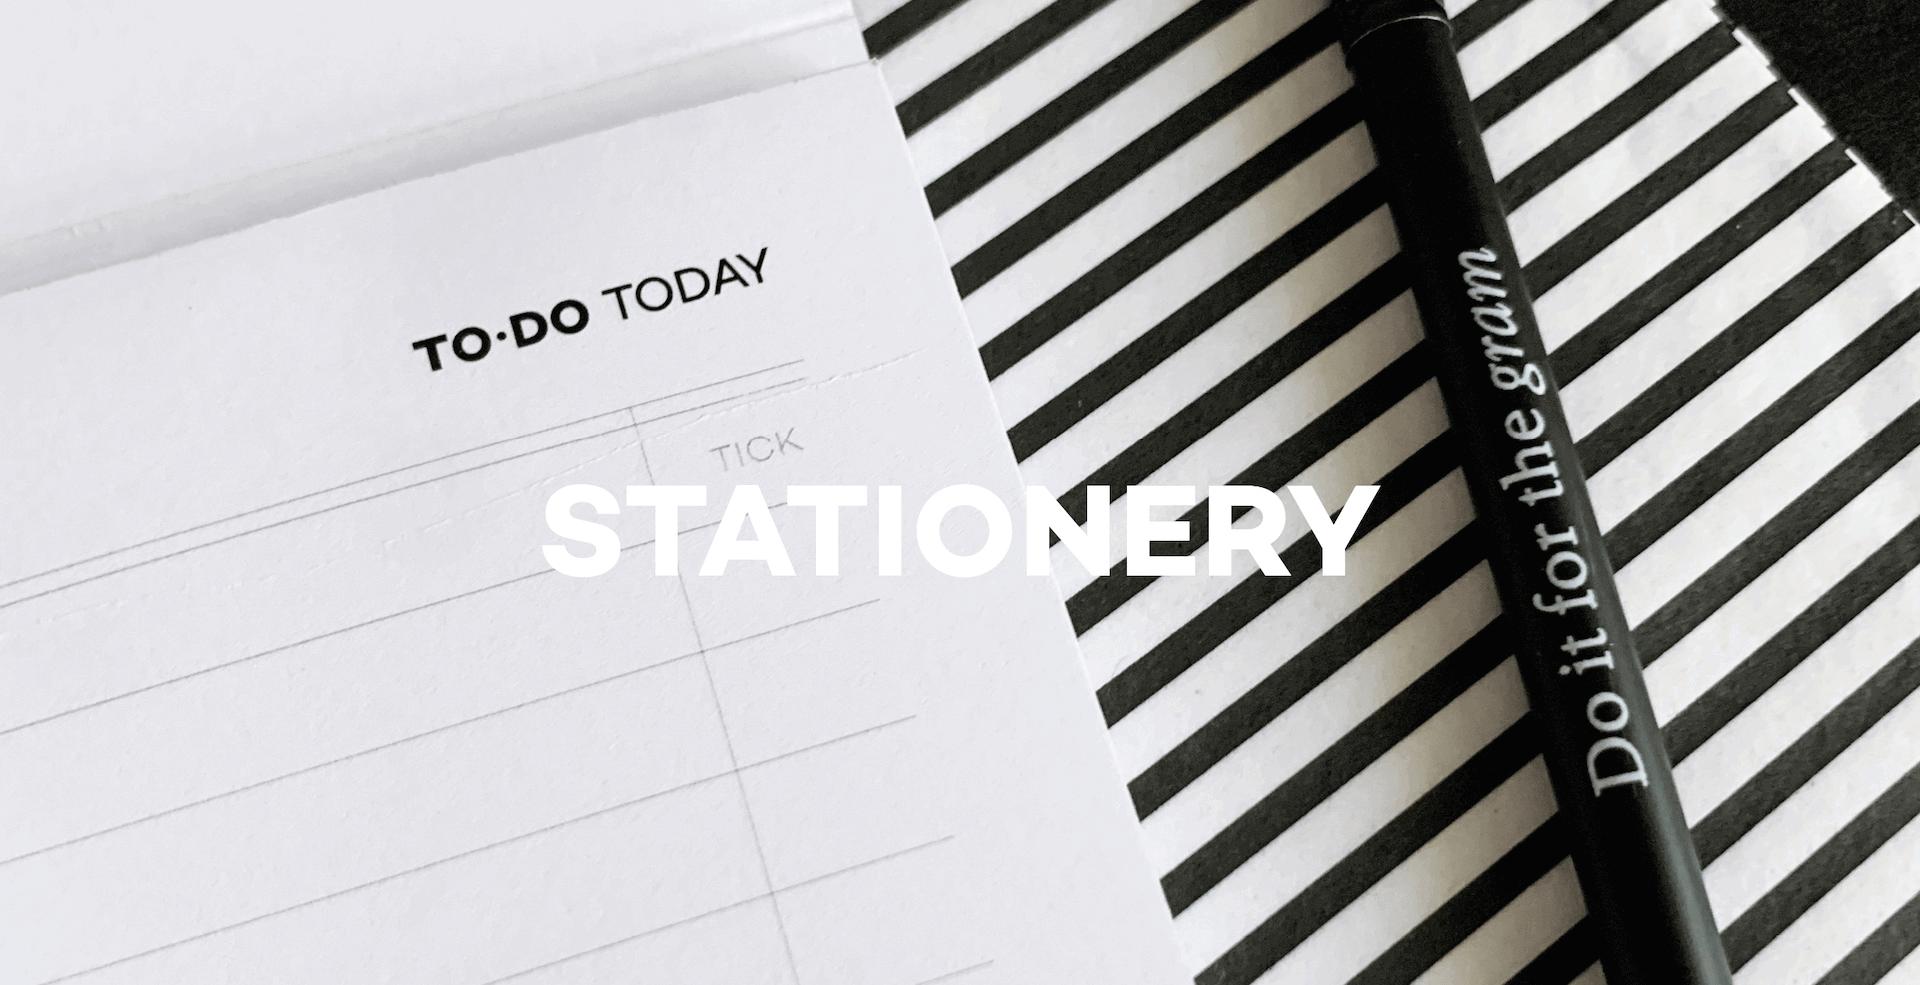 Stationery-Banner-1_resized2